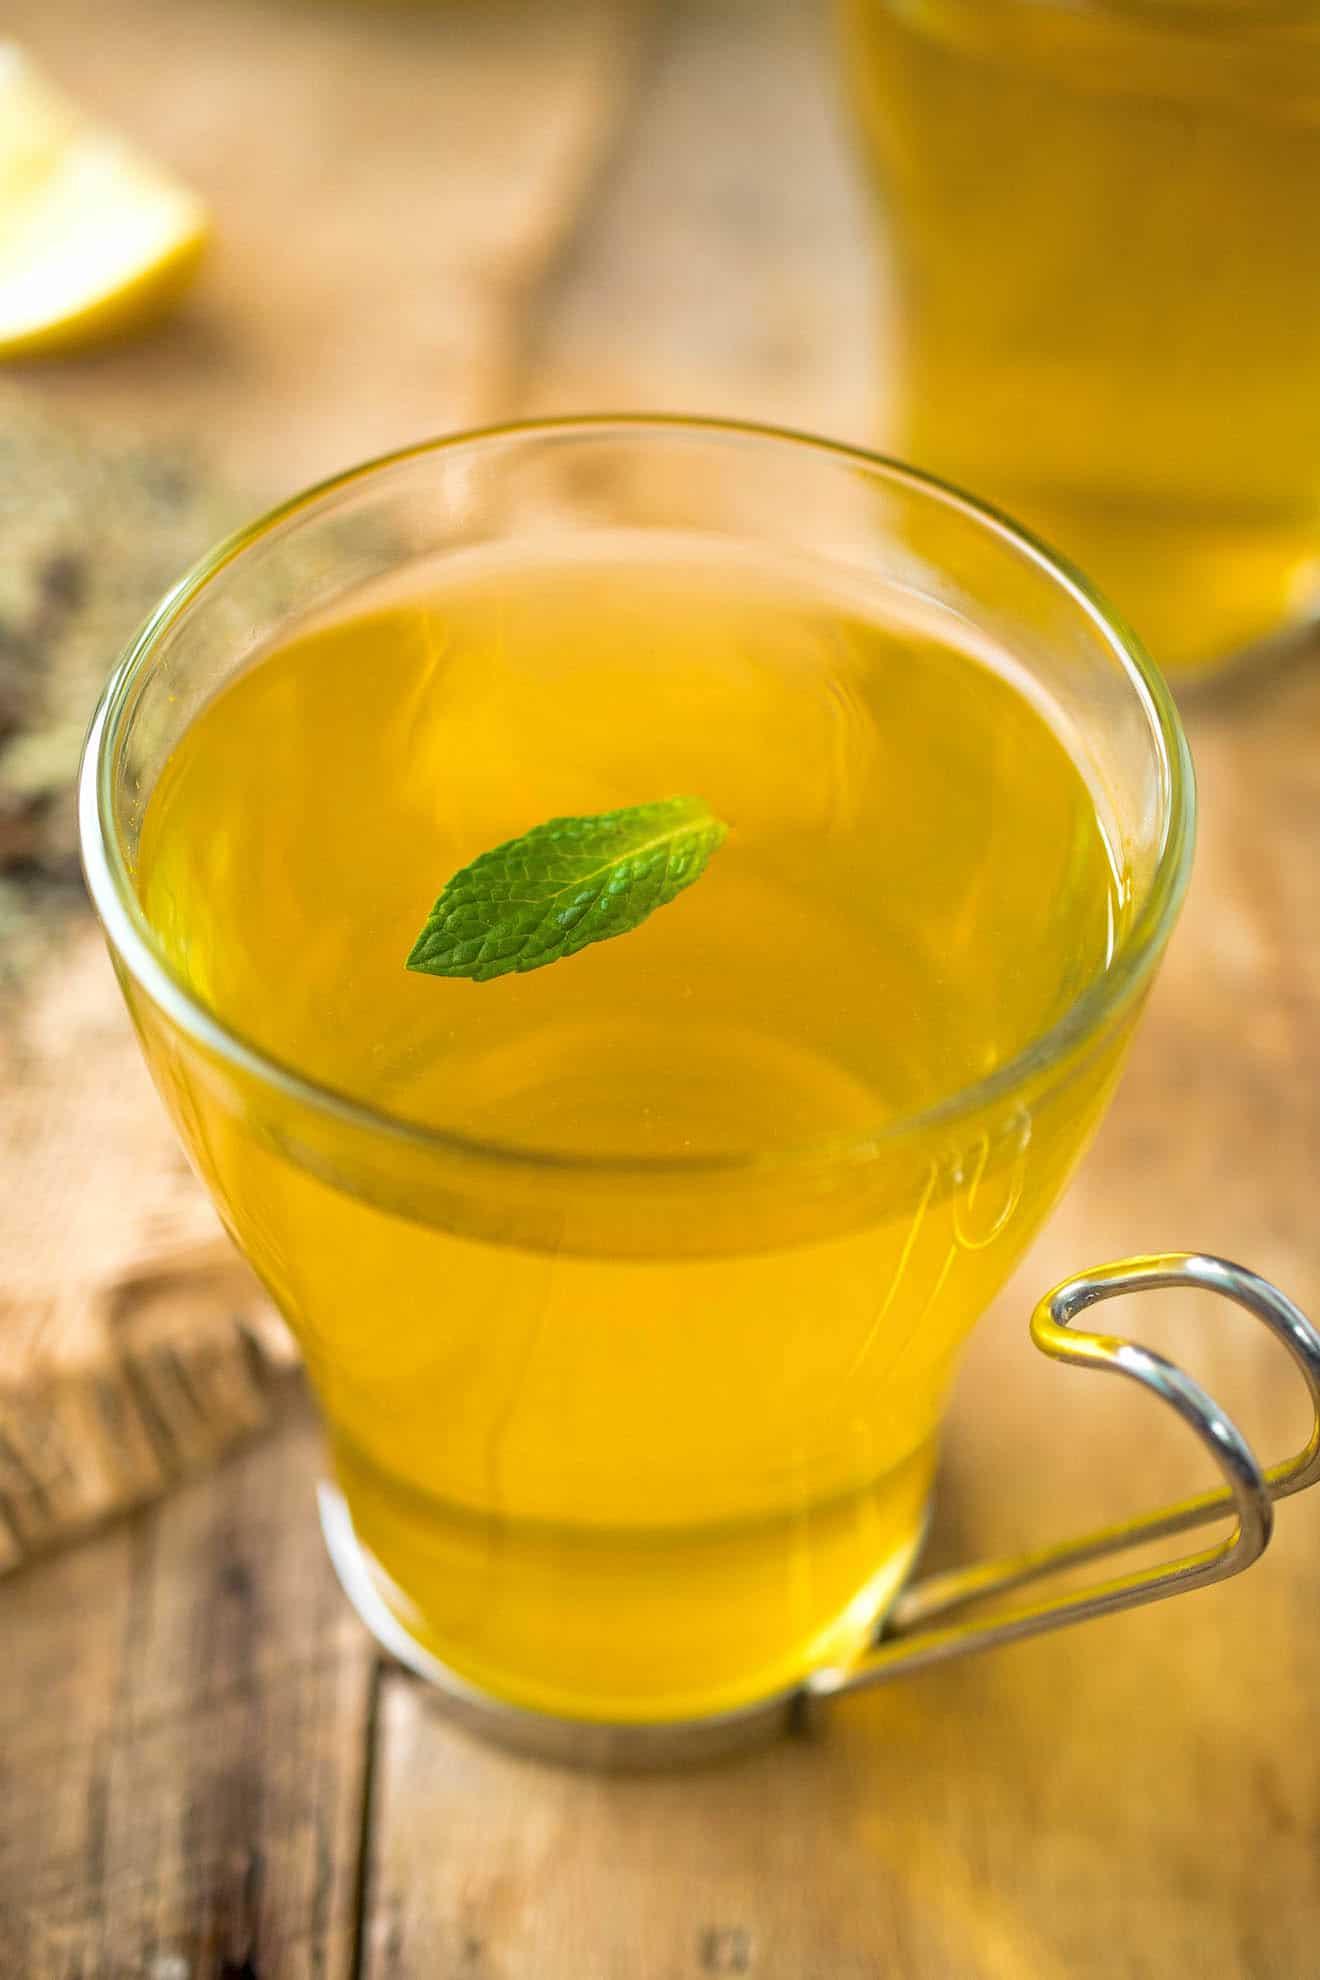 A glass mug of herbal tea with a mint leaf garnish